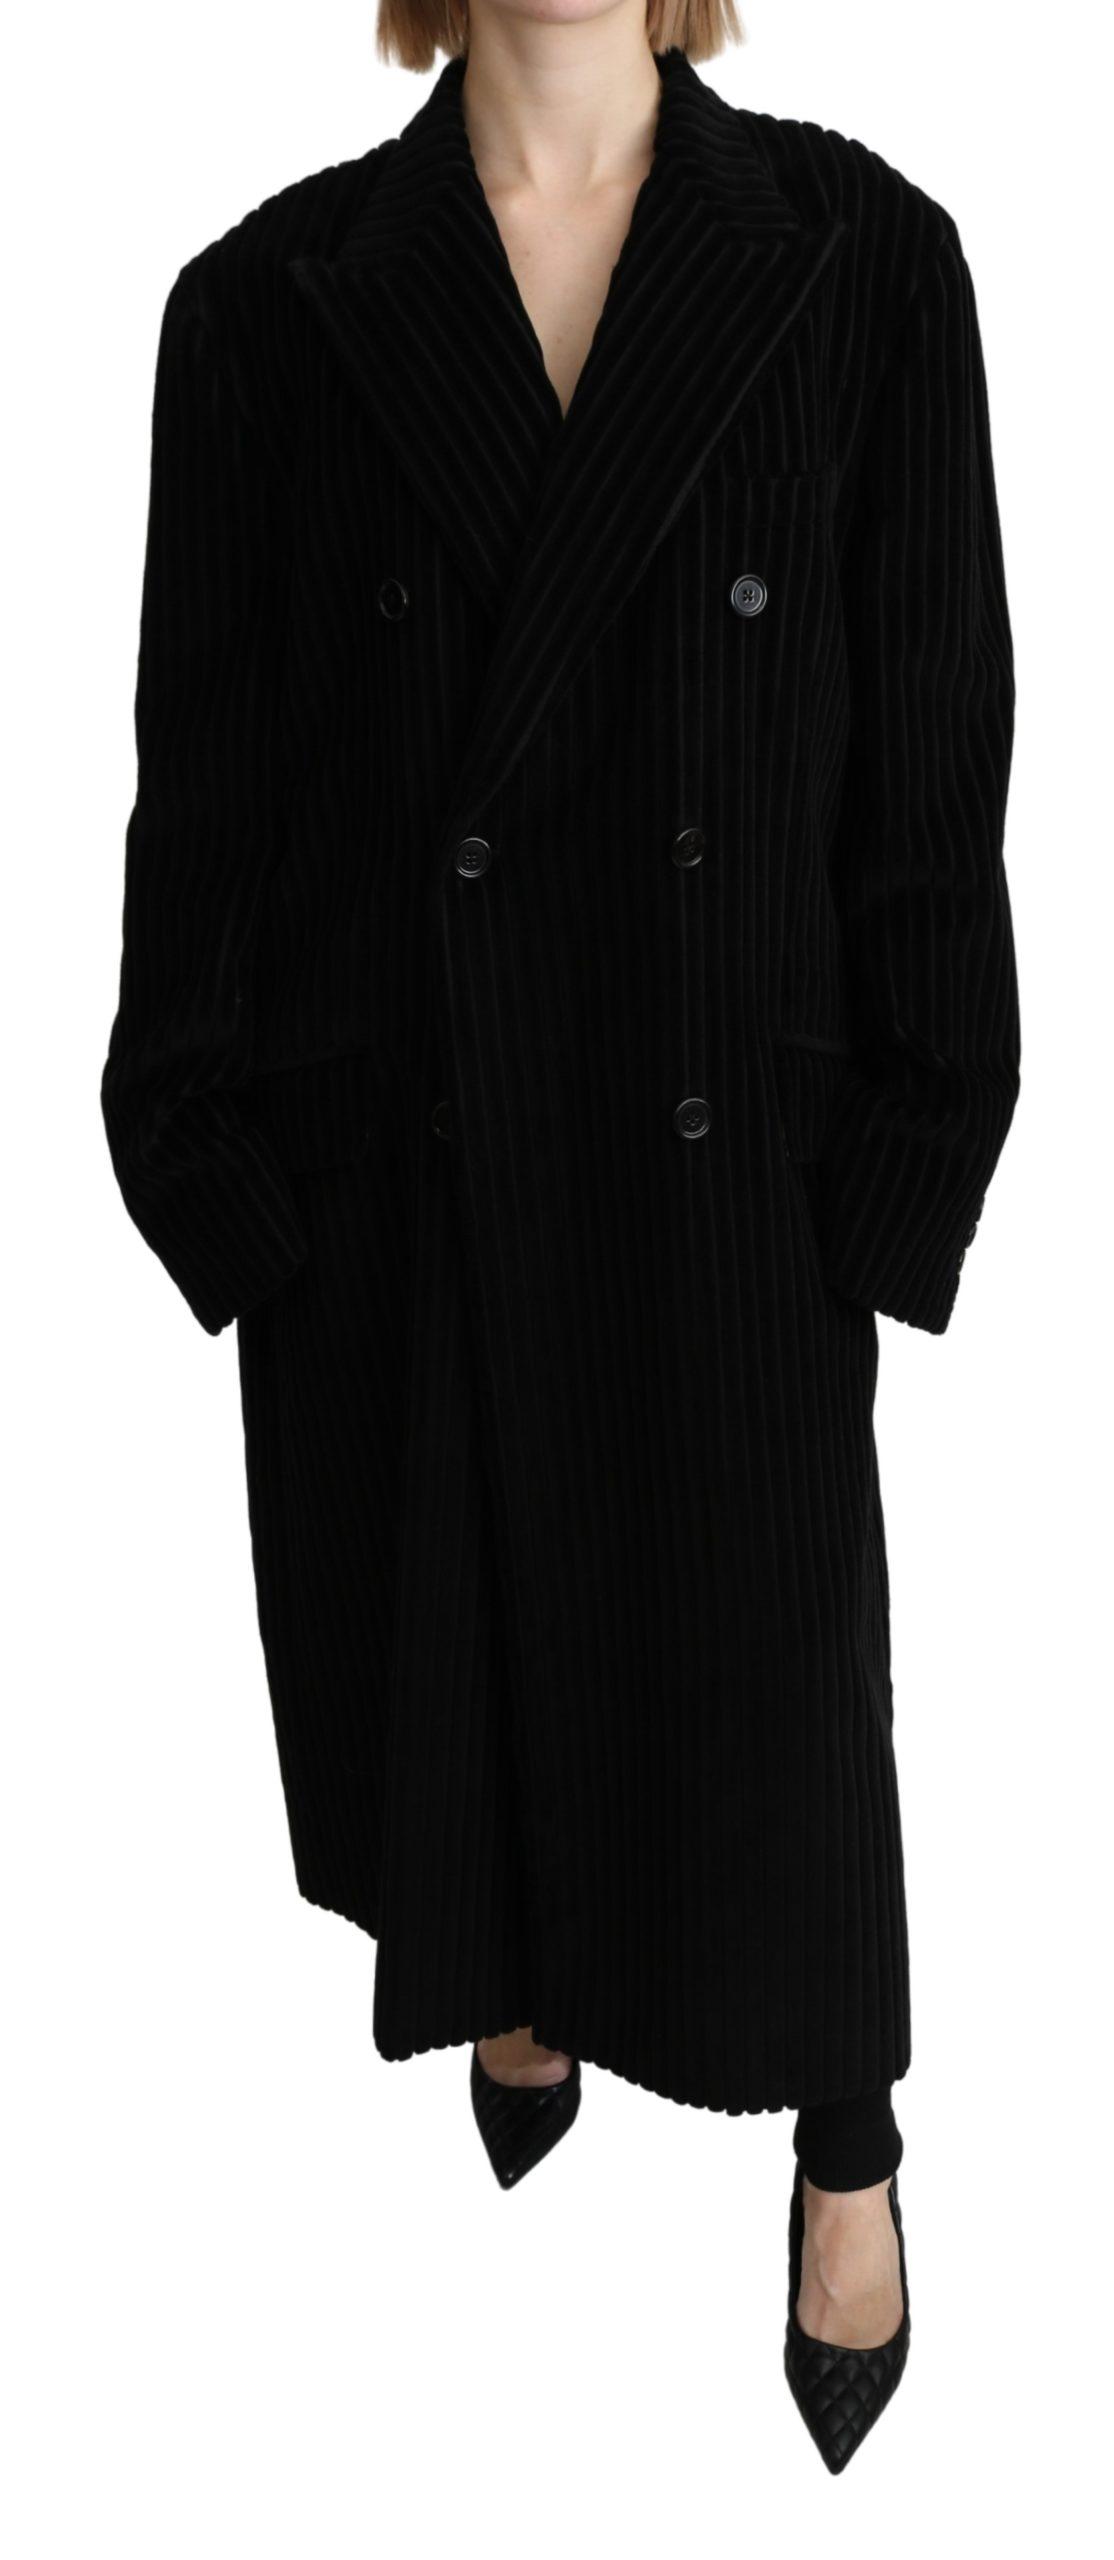 Dolce & Gabbana Women's Double Breasted Blazer Trenchcoat Jacket Black JKT2641 - IT40  L